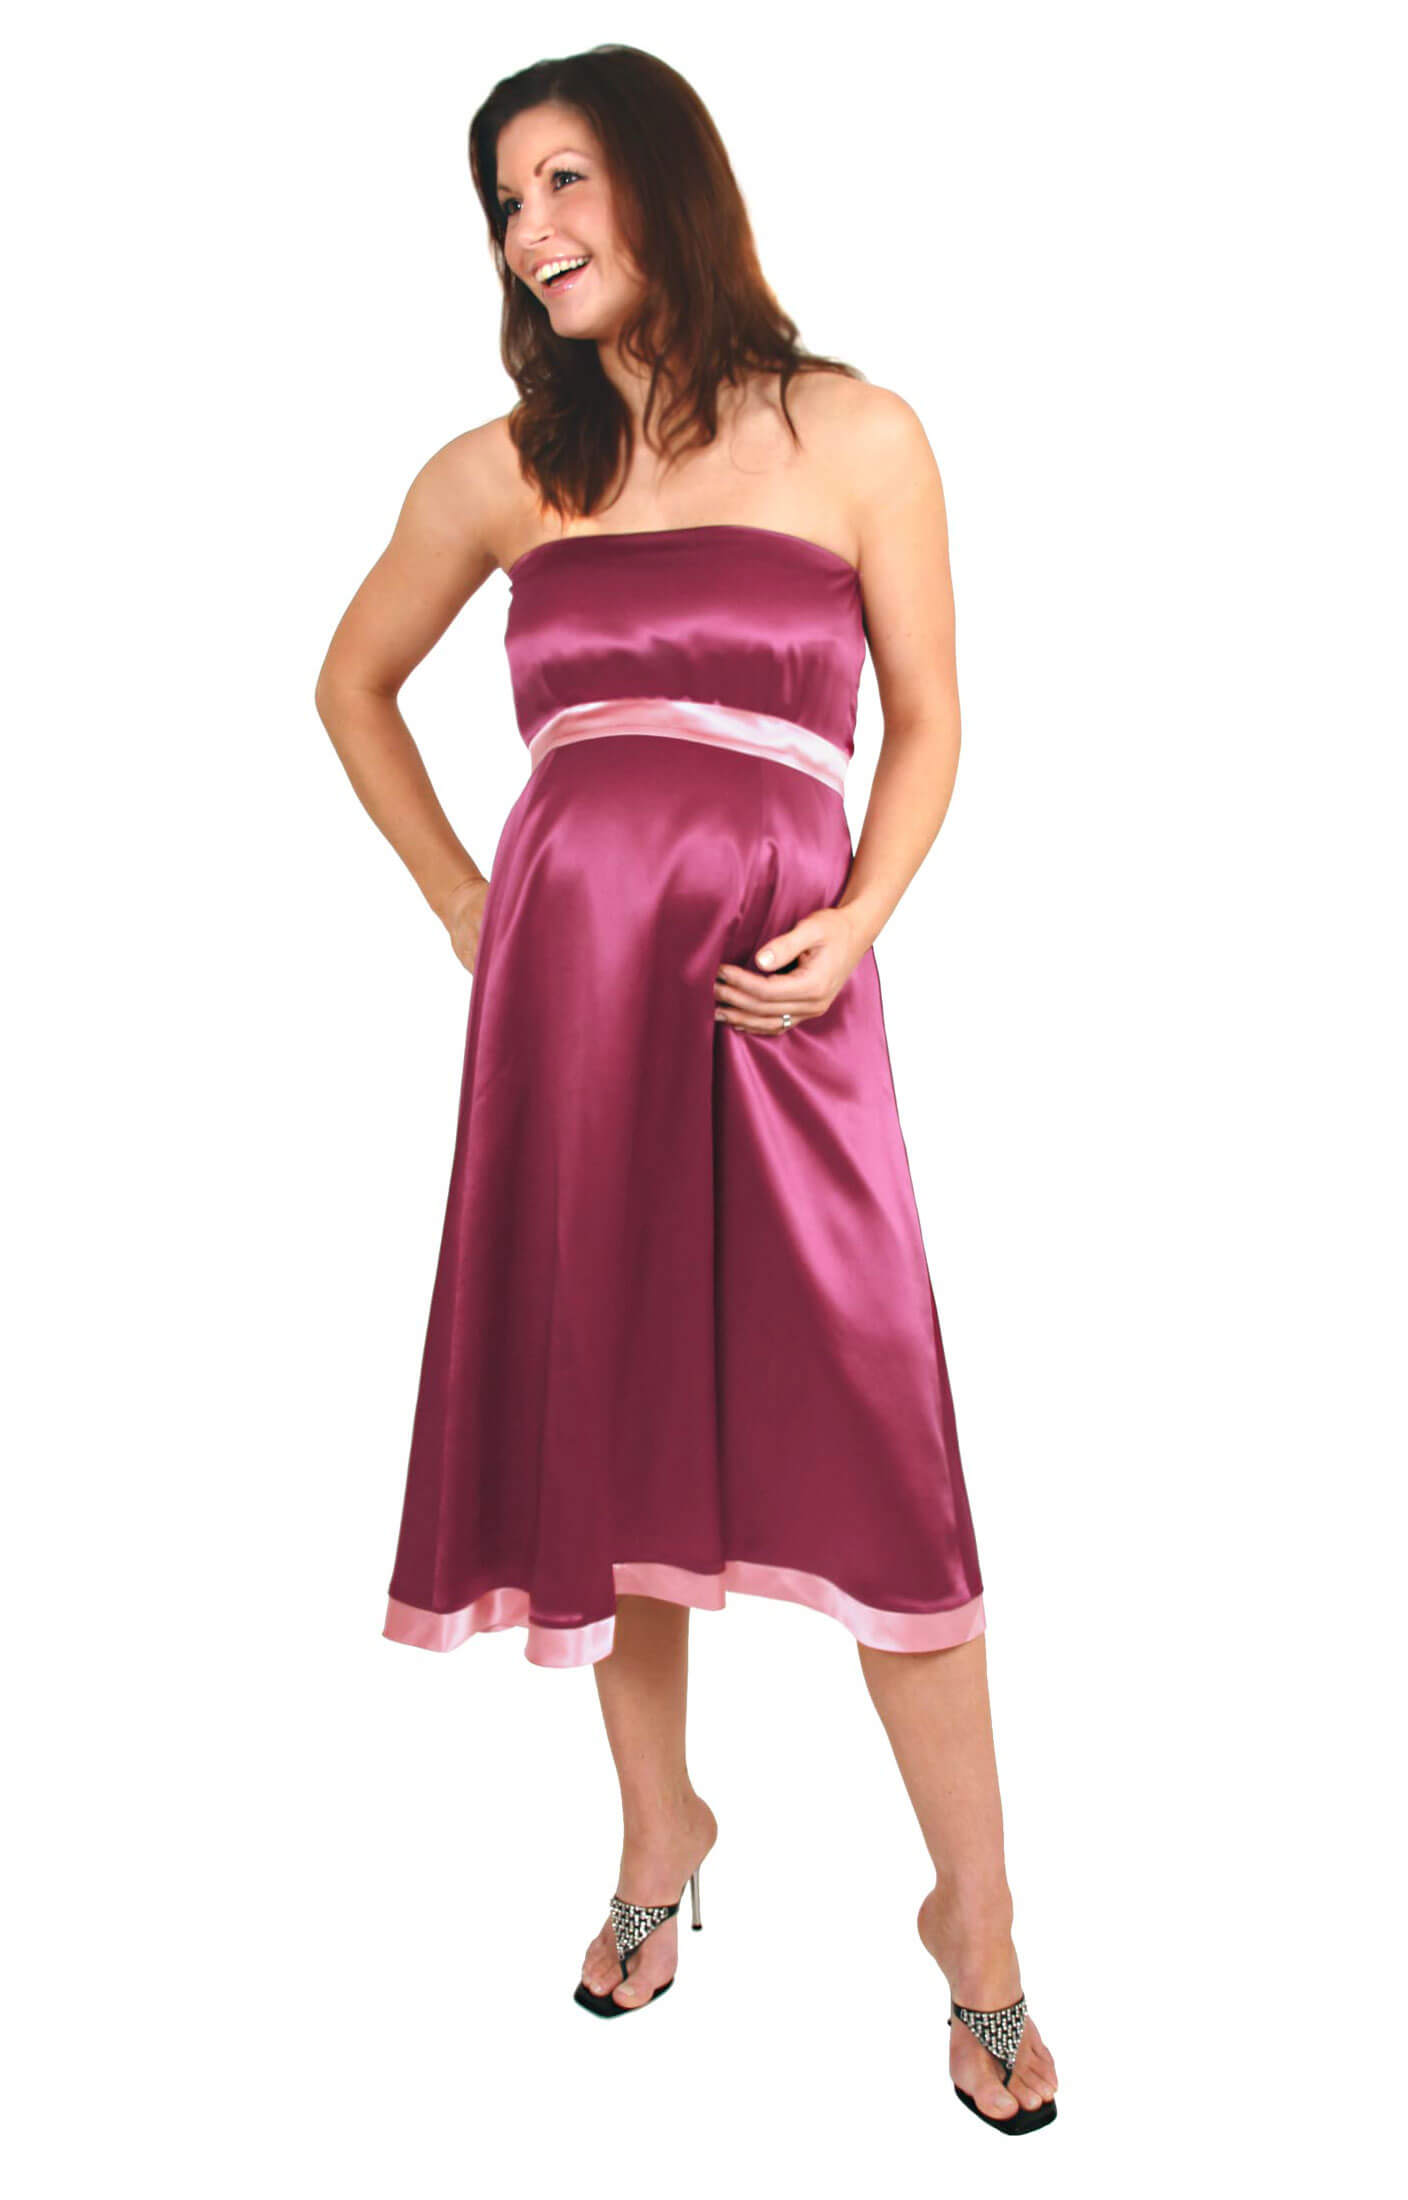 Silk atlantis maternity gown claret by tiffany rose